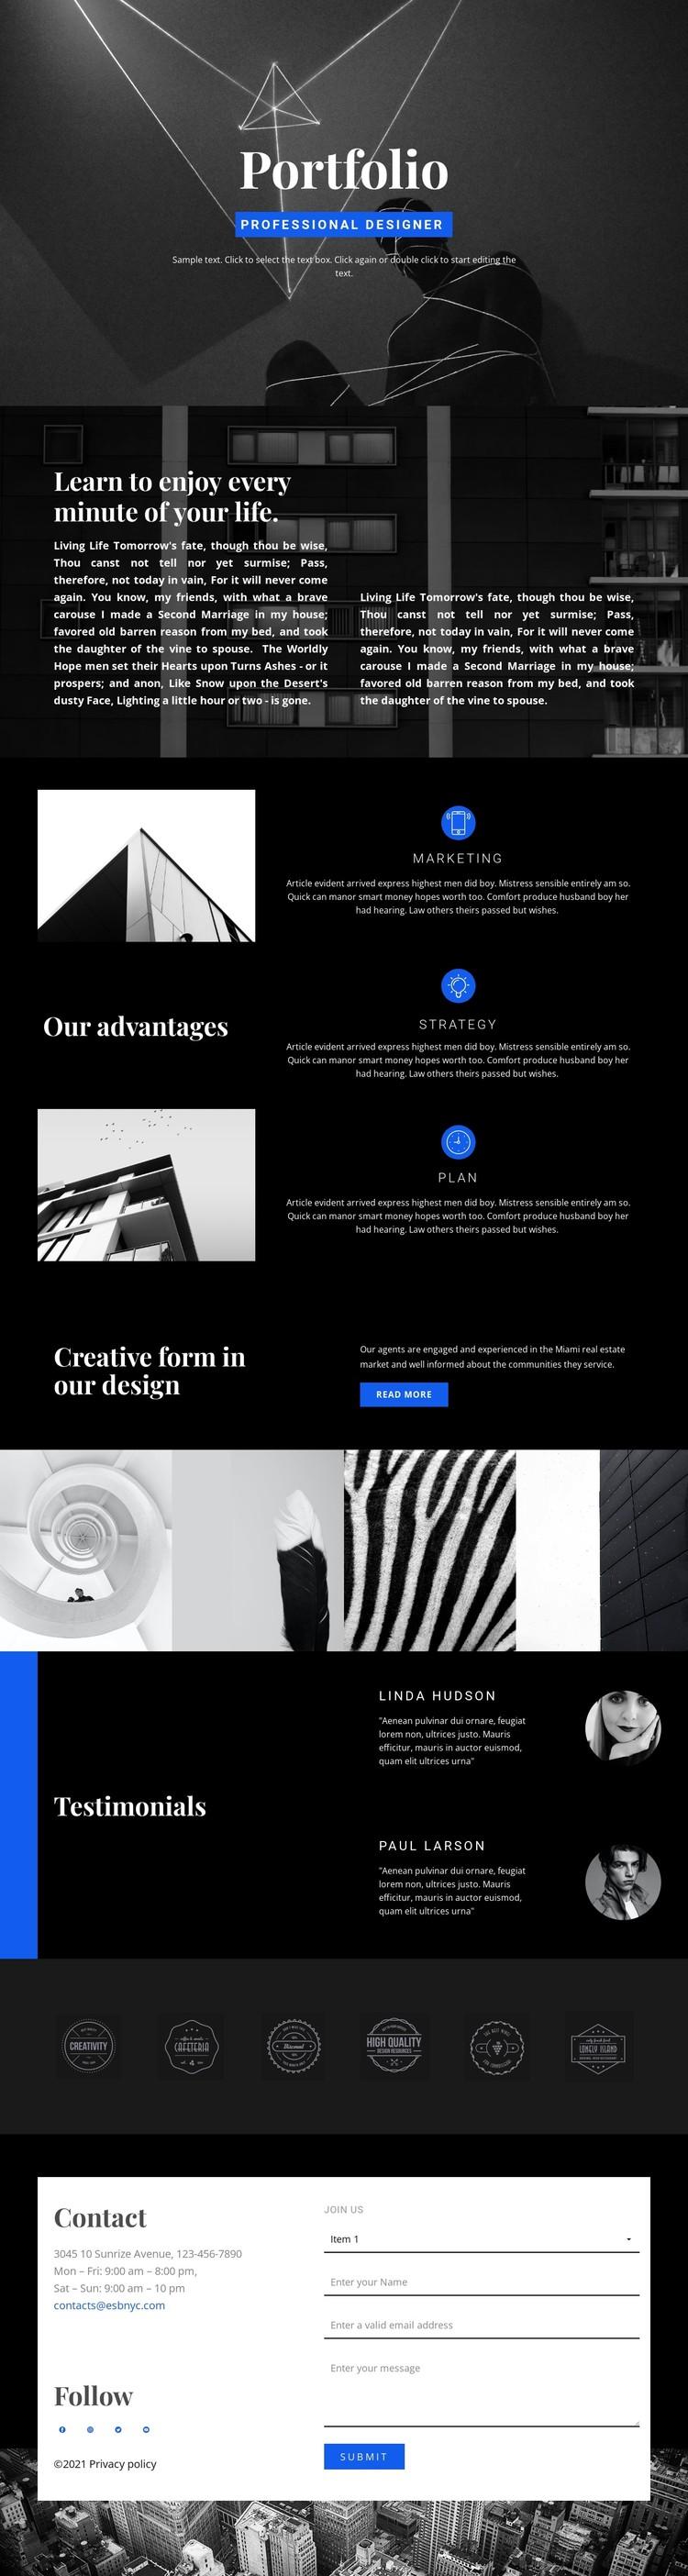 Fashion Designer Portfolio CSS Template